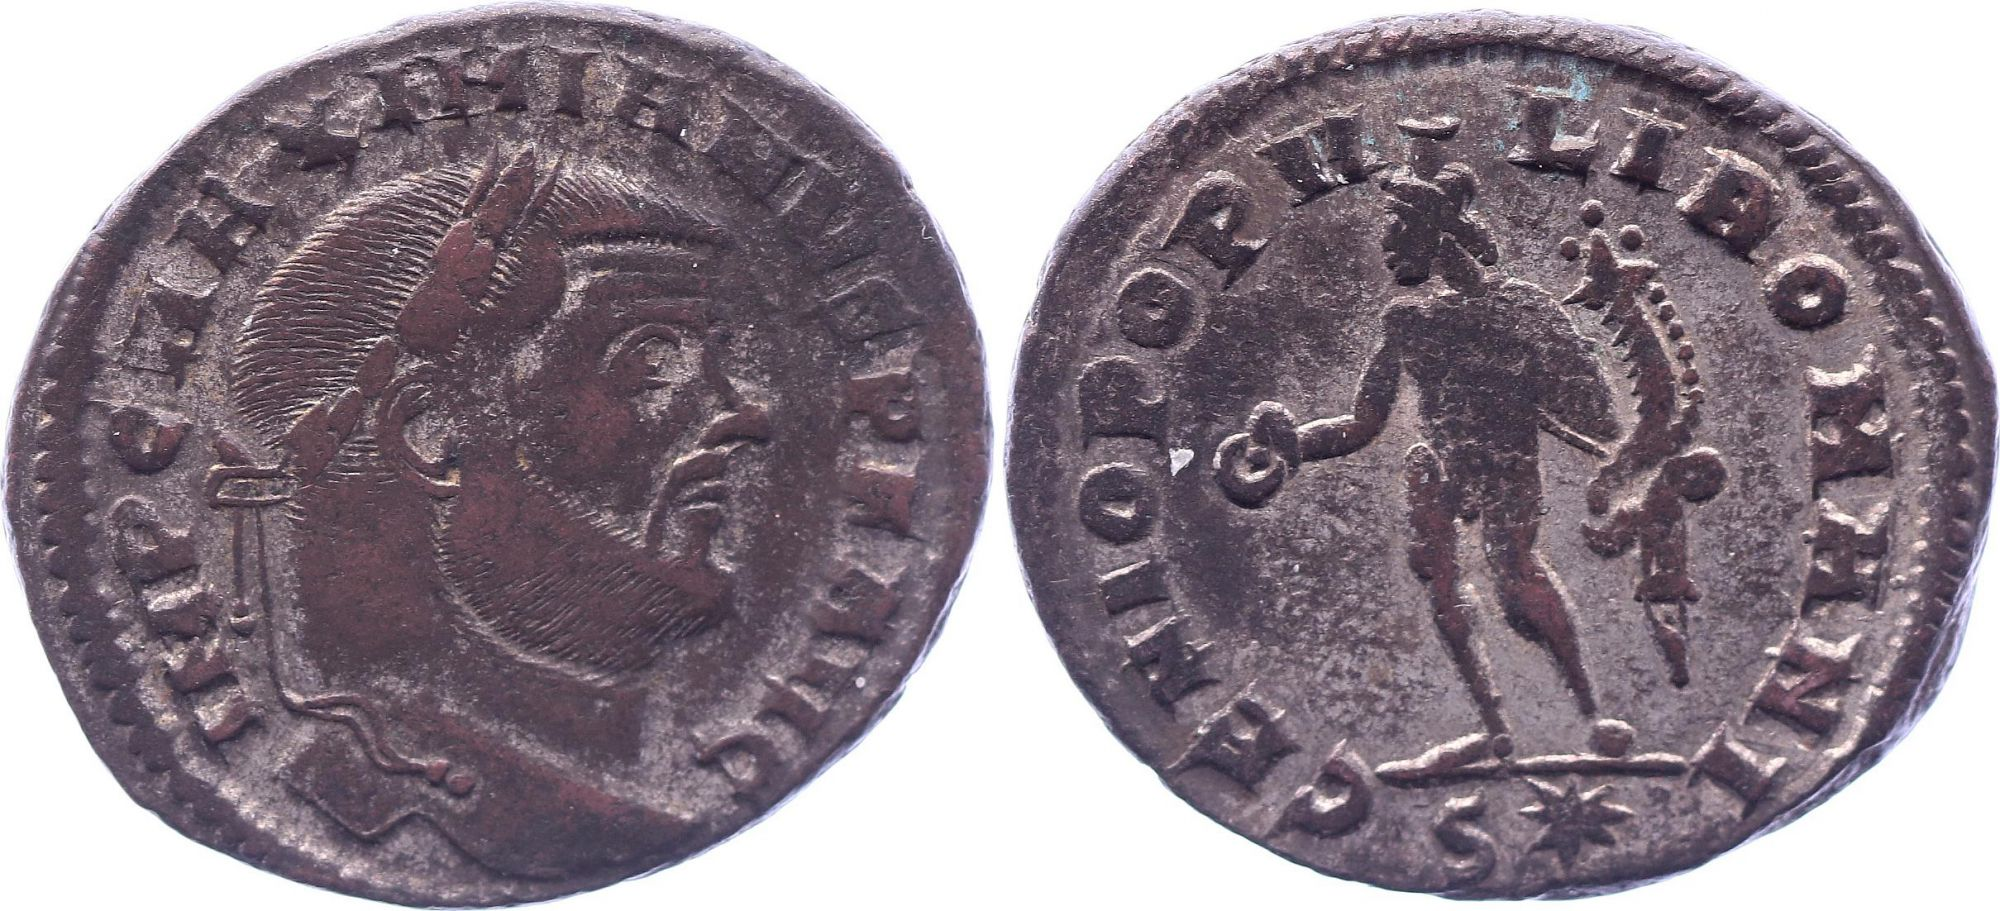 Rome Empire Follis, Maximien Hercule (286-305) - Genio Populi Romani - Lyon